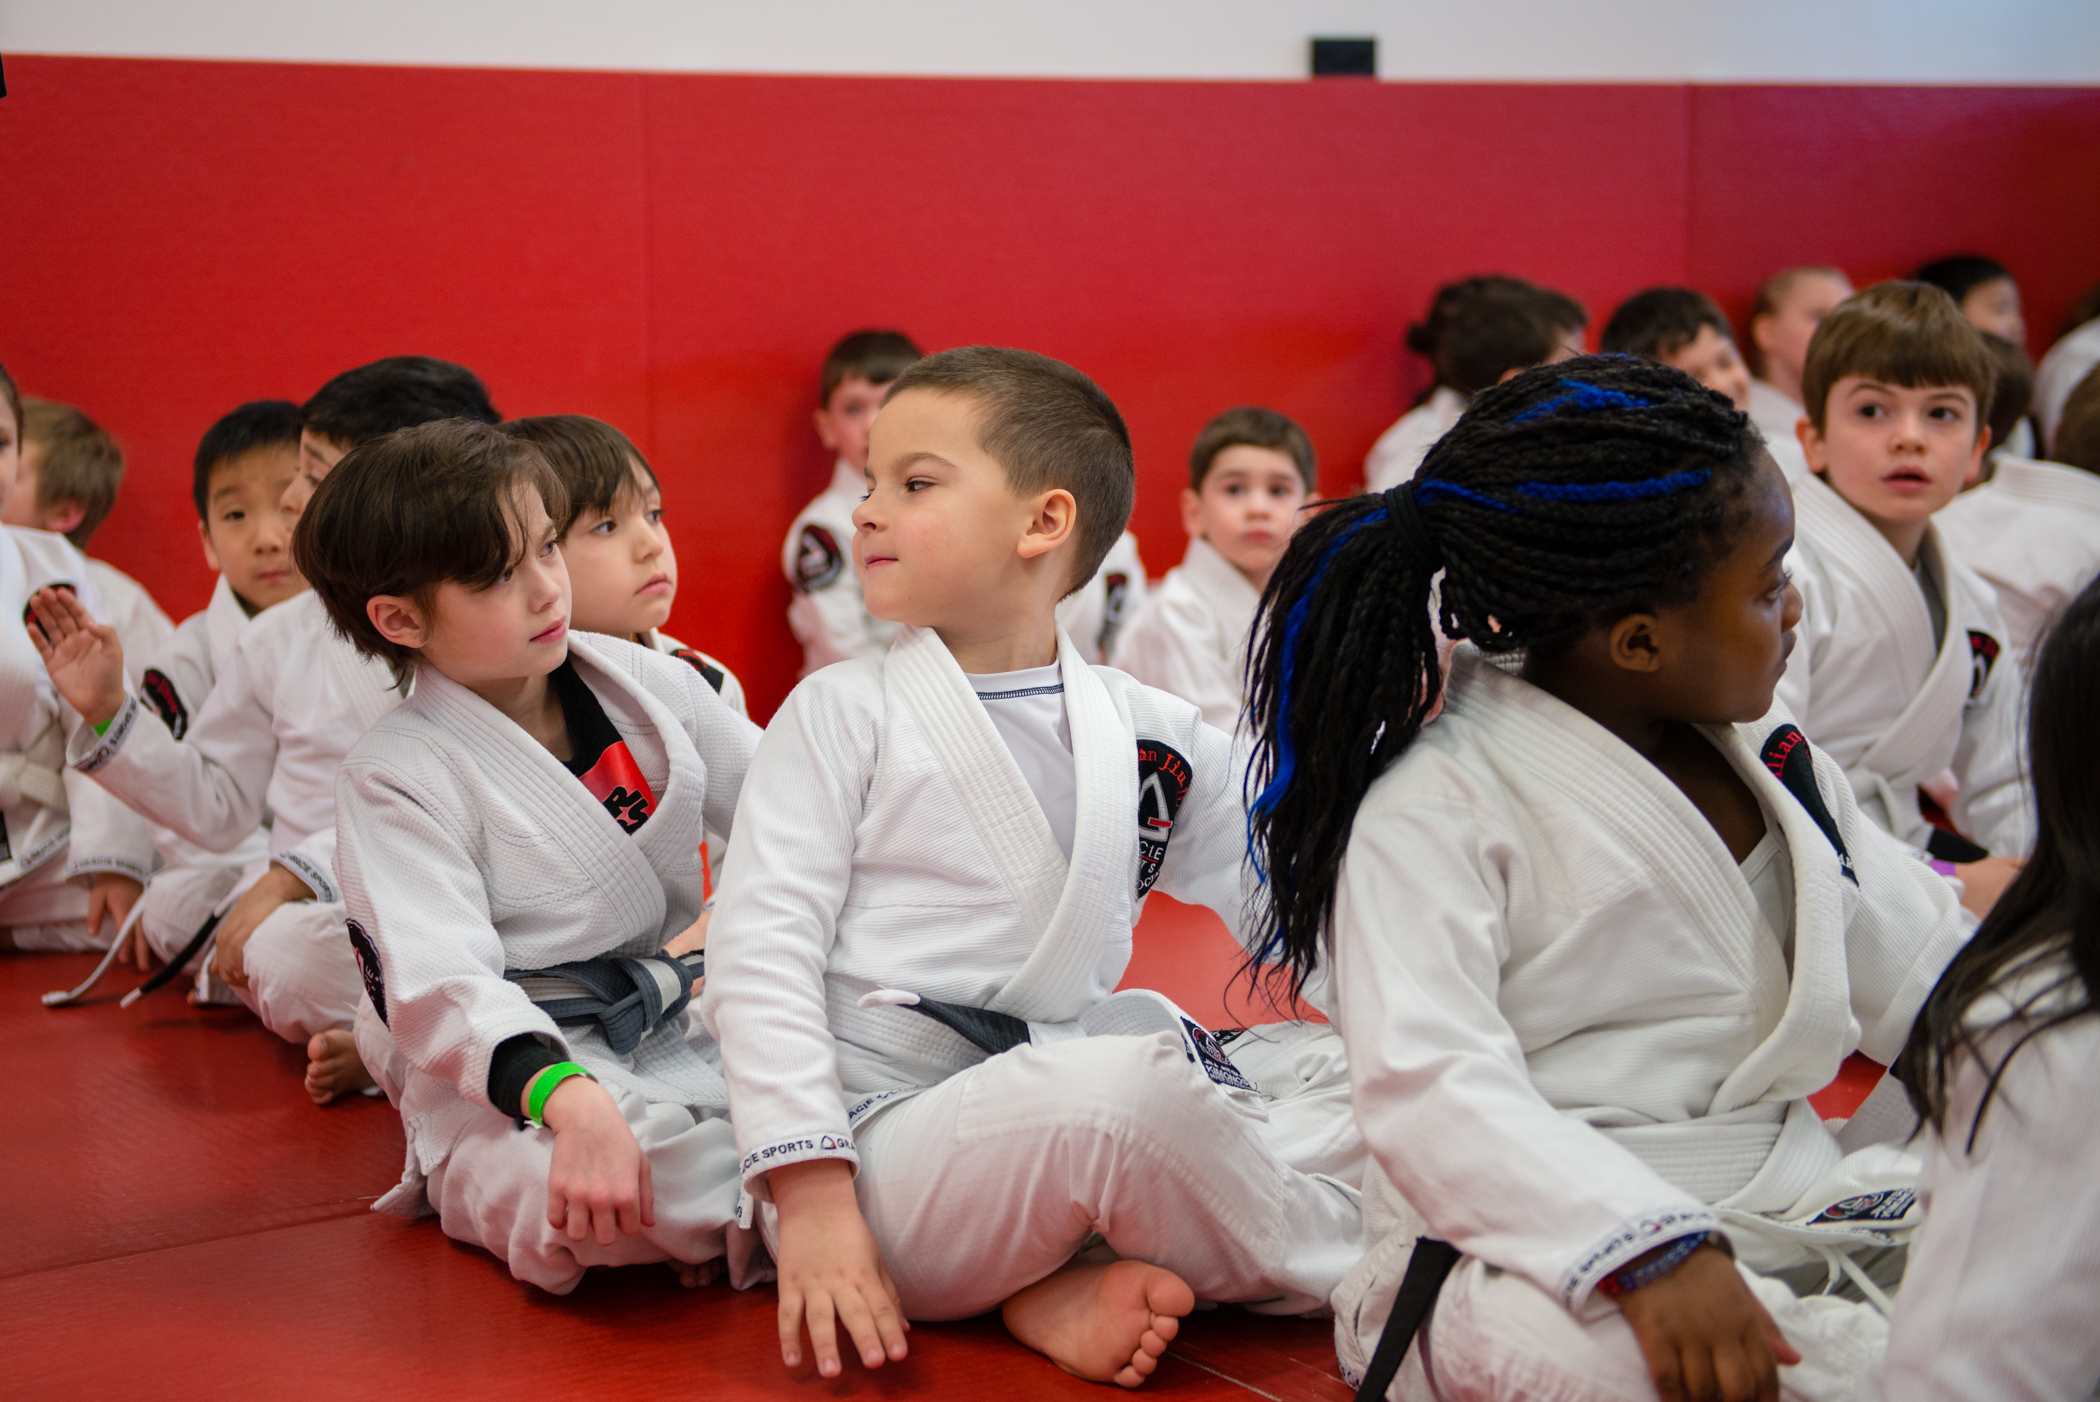 Gracie-Sports-Kids-13.jpg